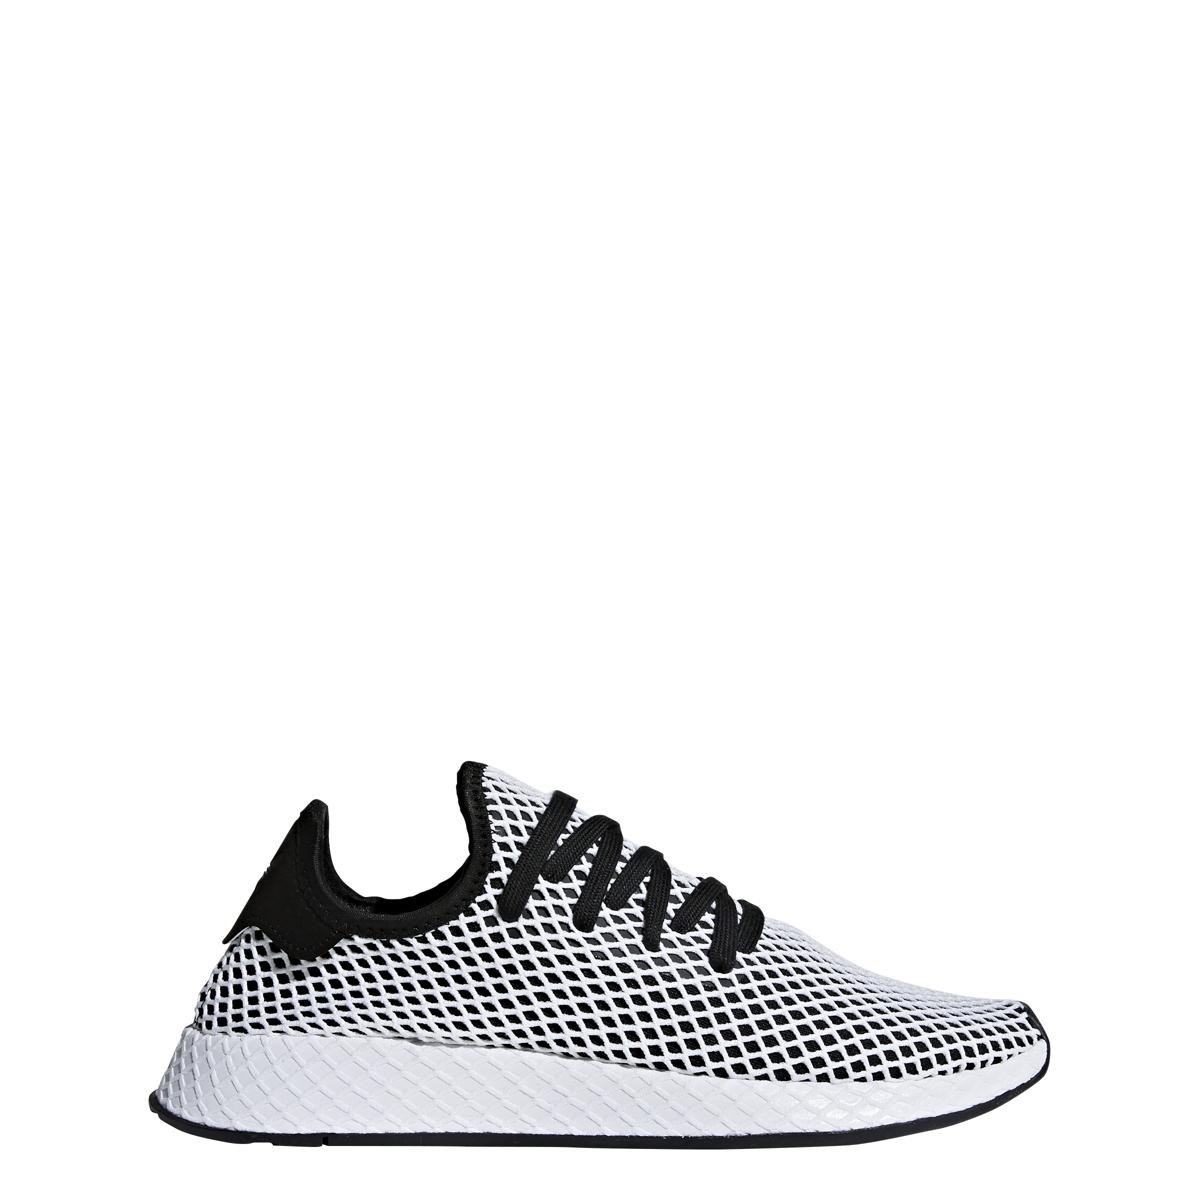 Adidas Deerupt in Black/White/Blue — MAJOR